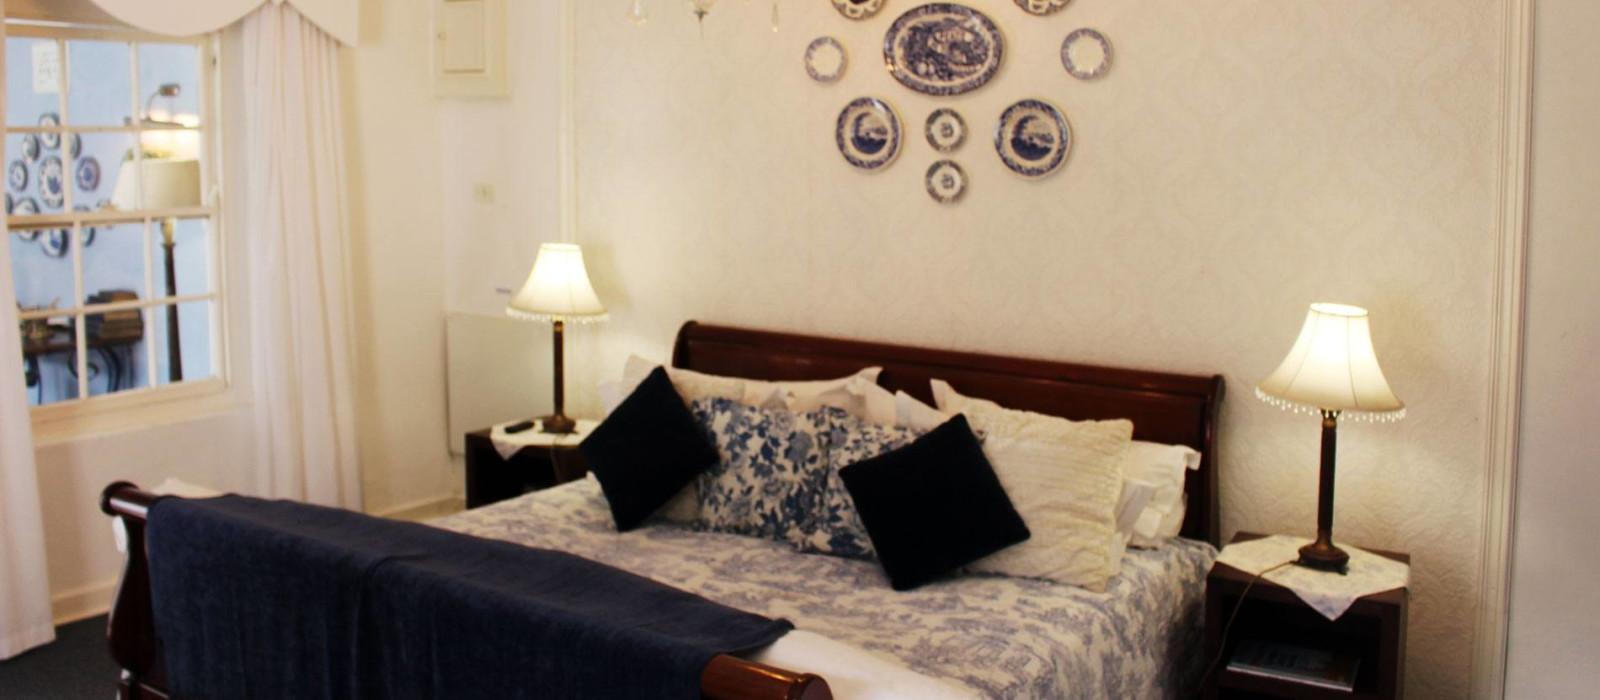 Hotel Cleopatra Mountain Farmhouse South Africa